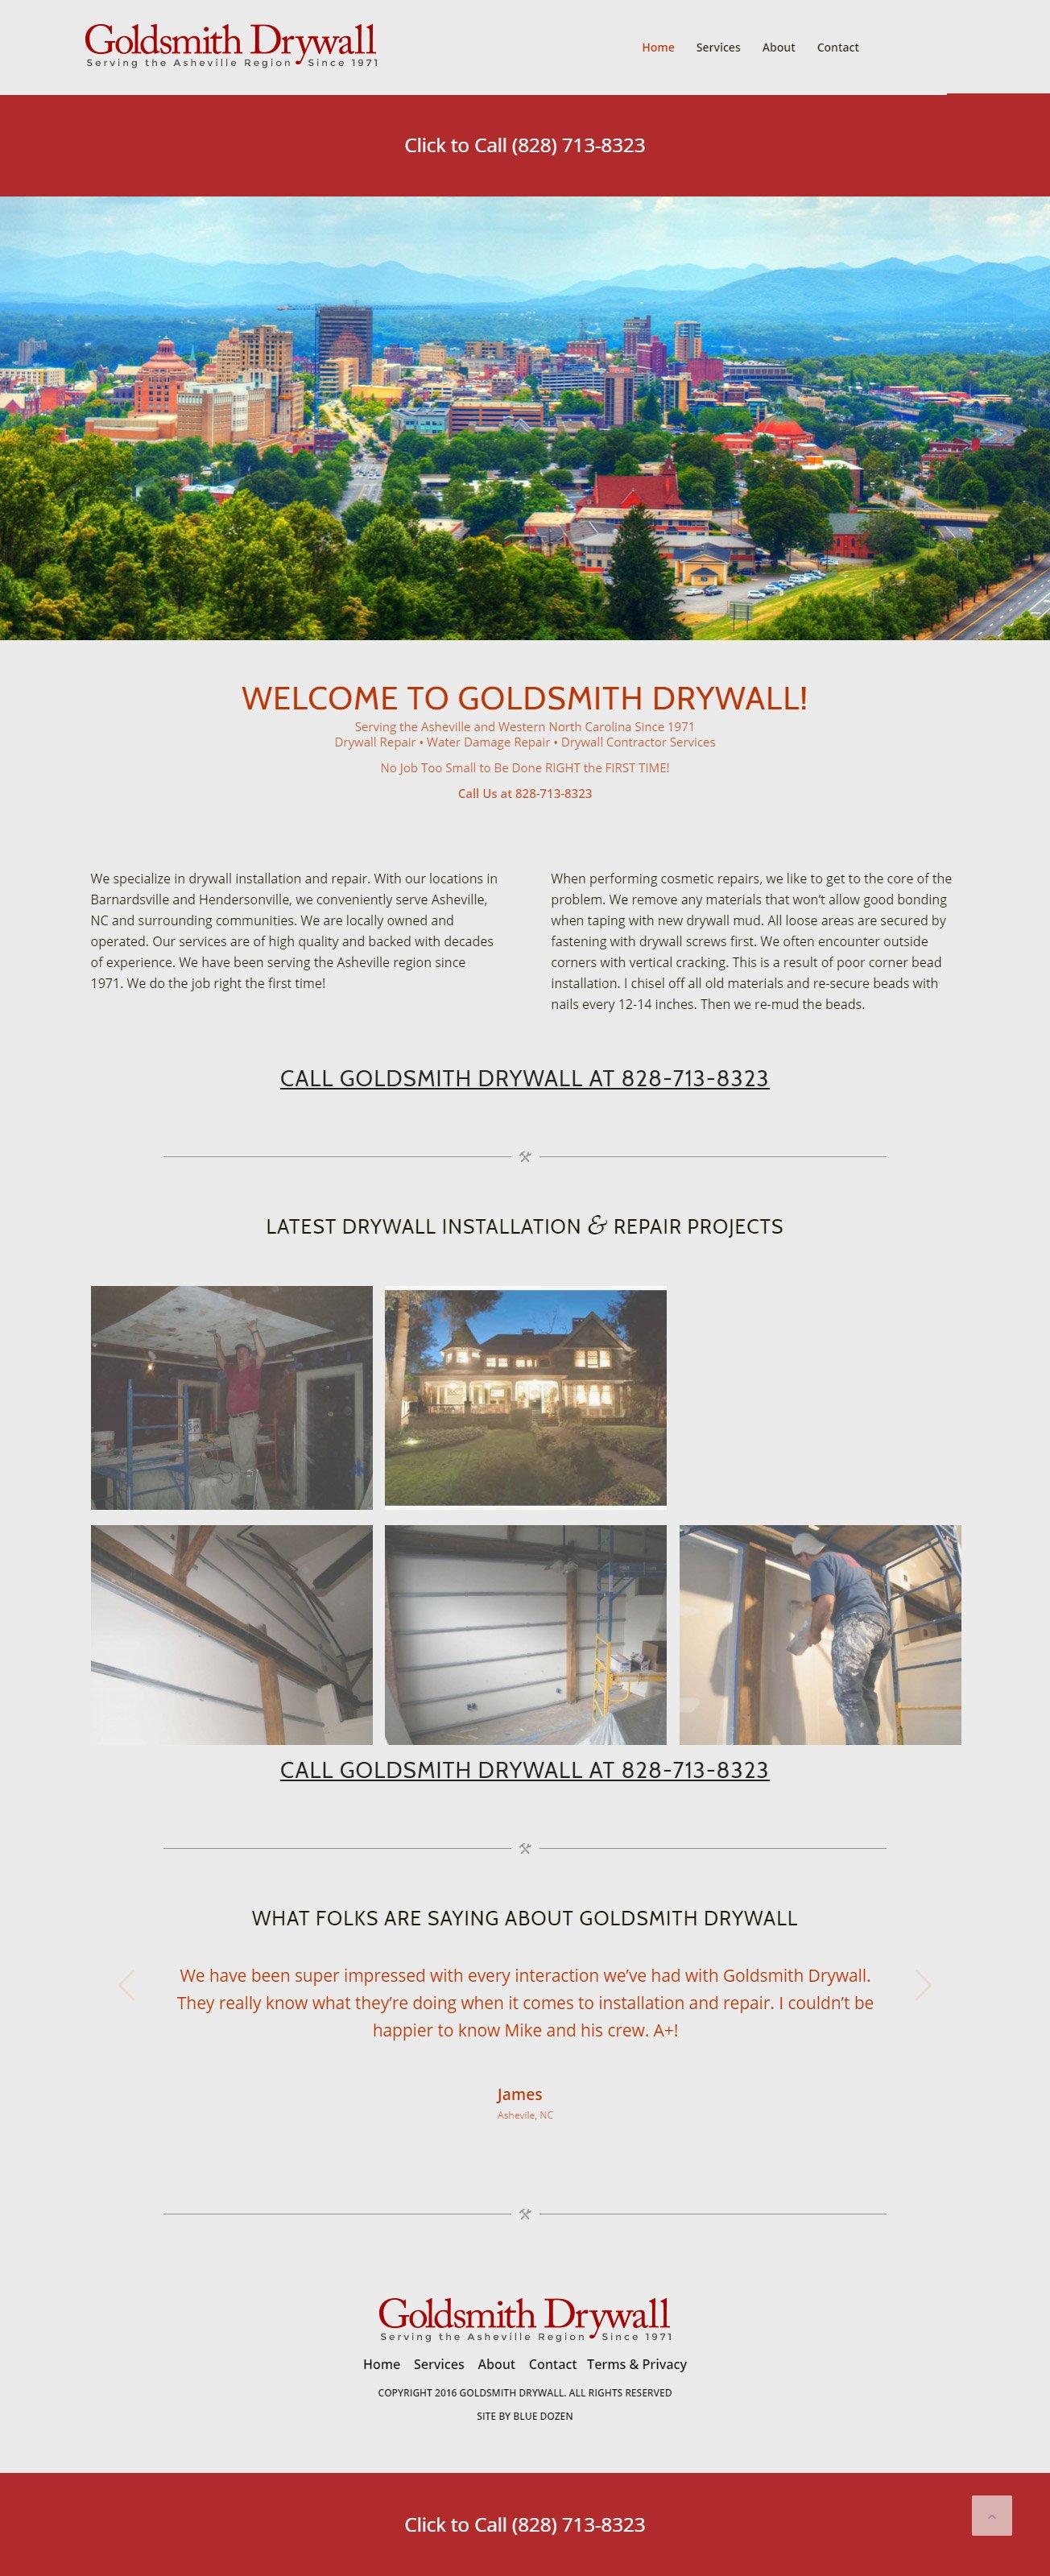 Goldsmith Drywall Website Design